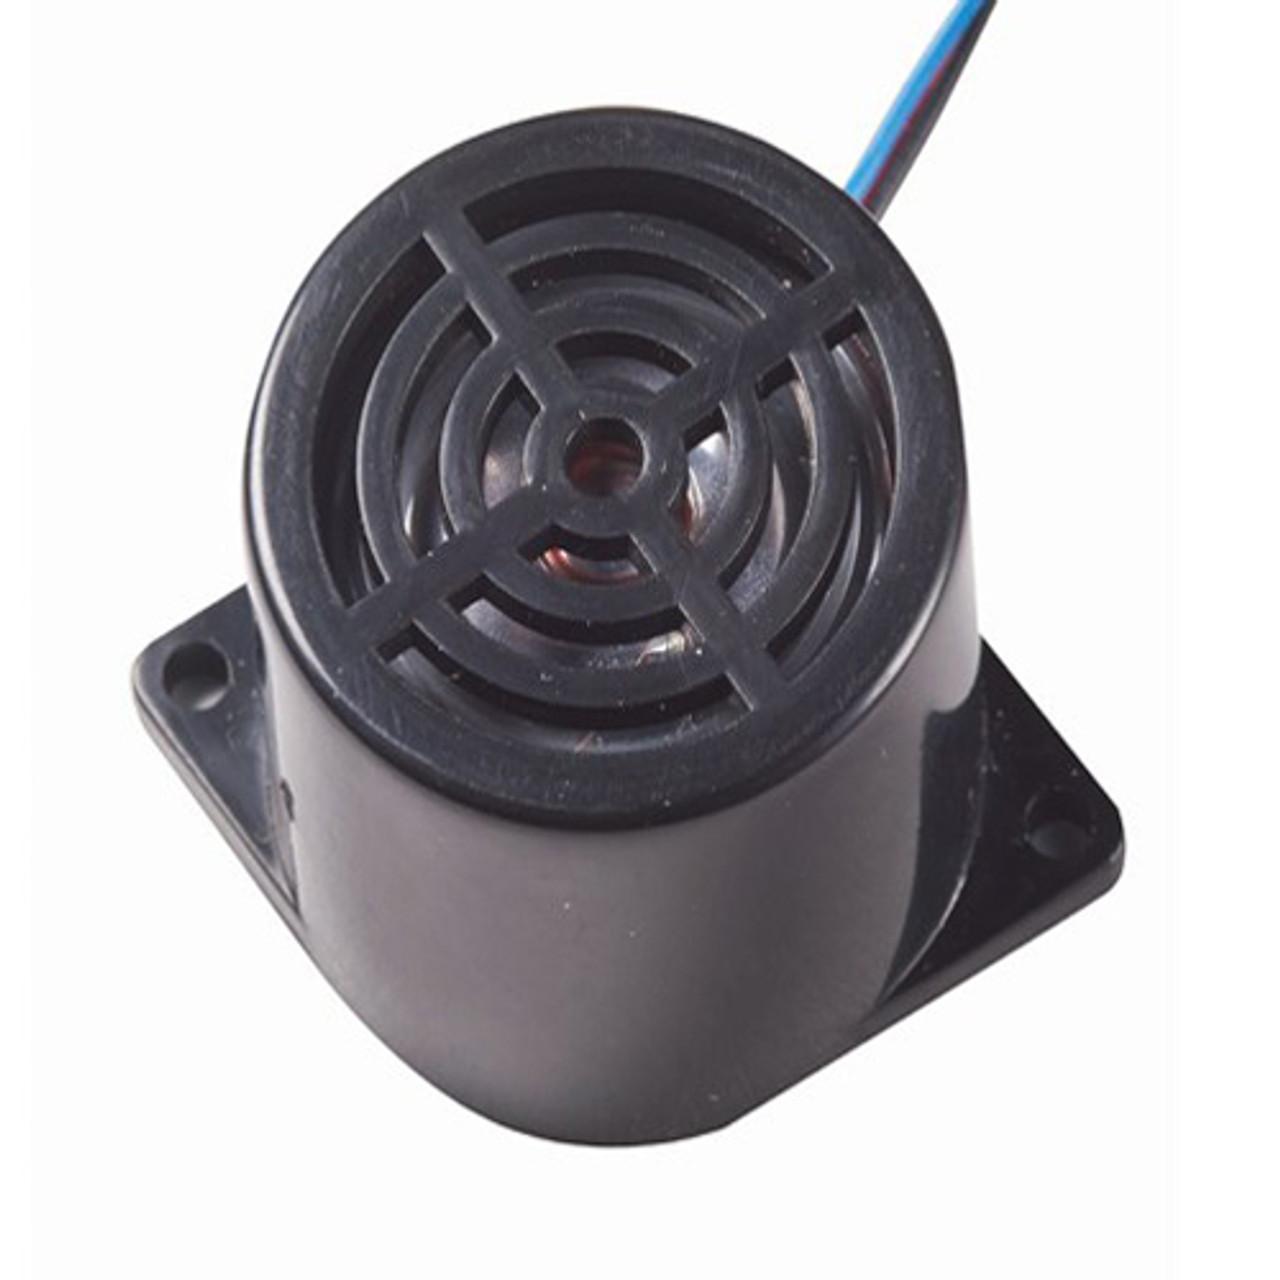 ASP-PA-200 ASP Alarm Control Chime Tone Electronic Buzzers